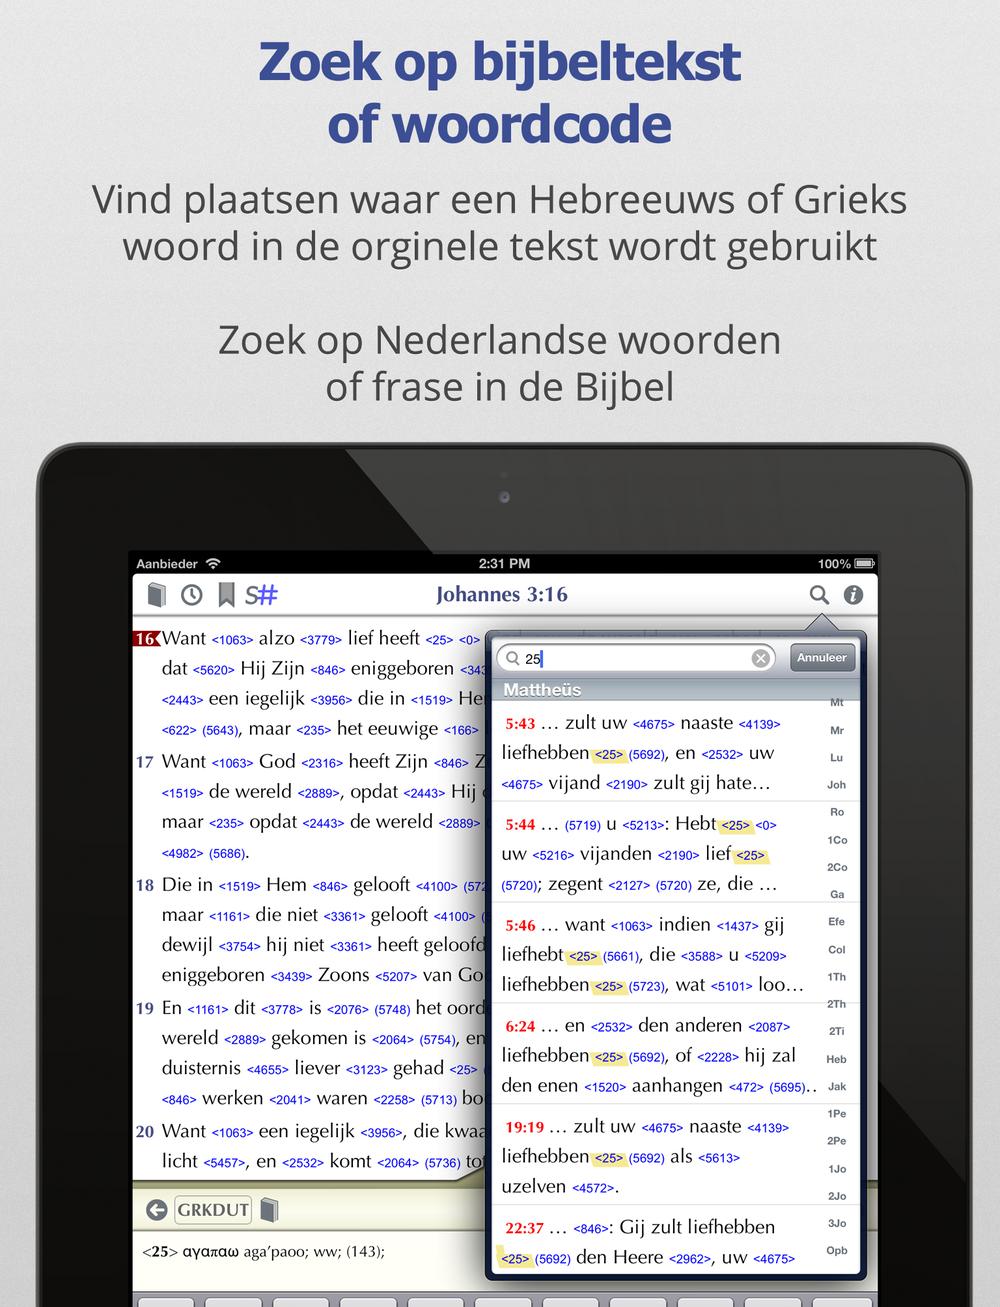 appStore-Screeshot-1536x2008-P-2.png